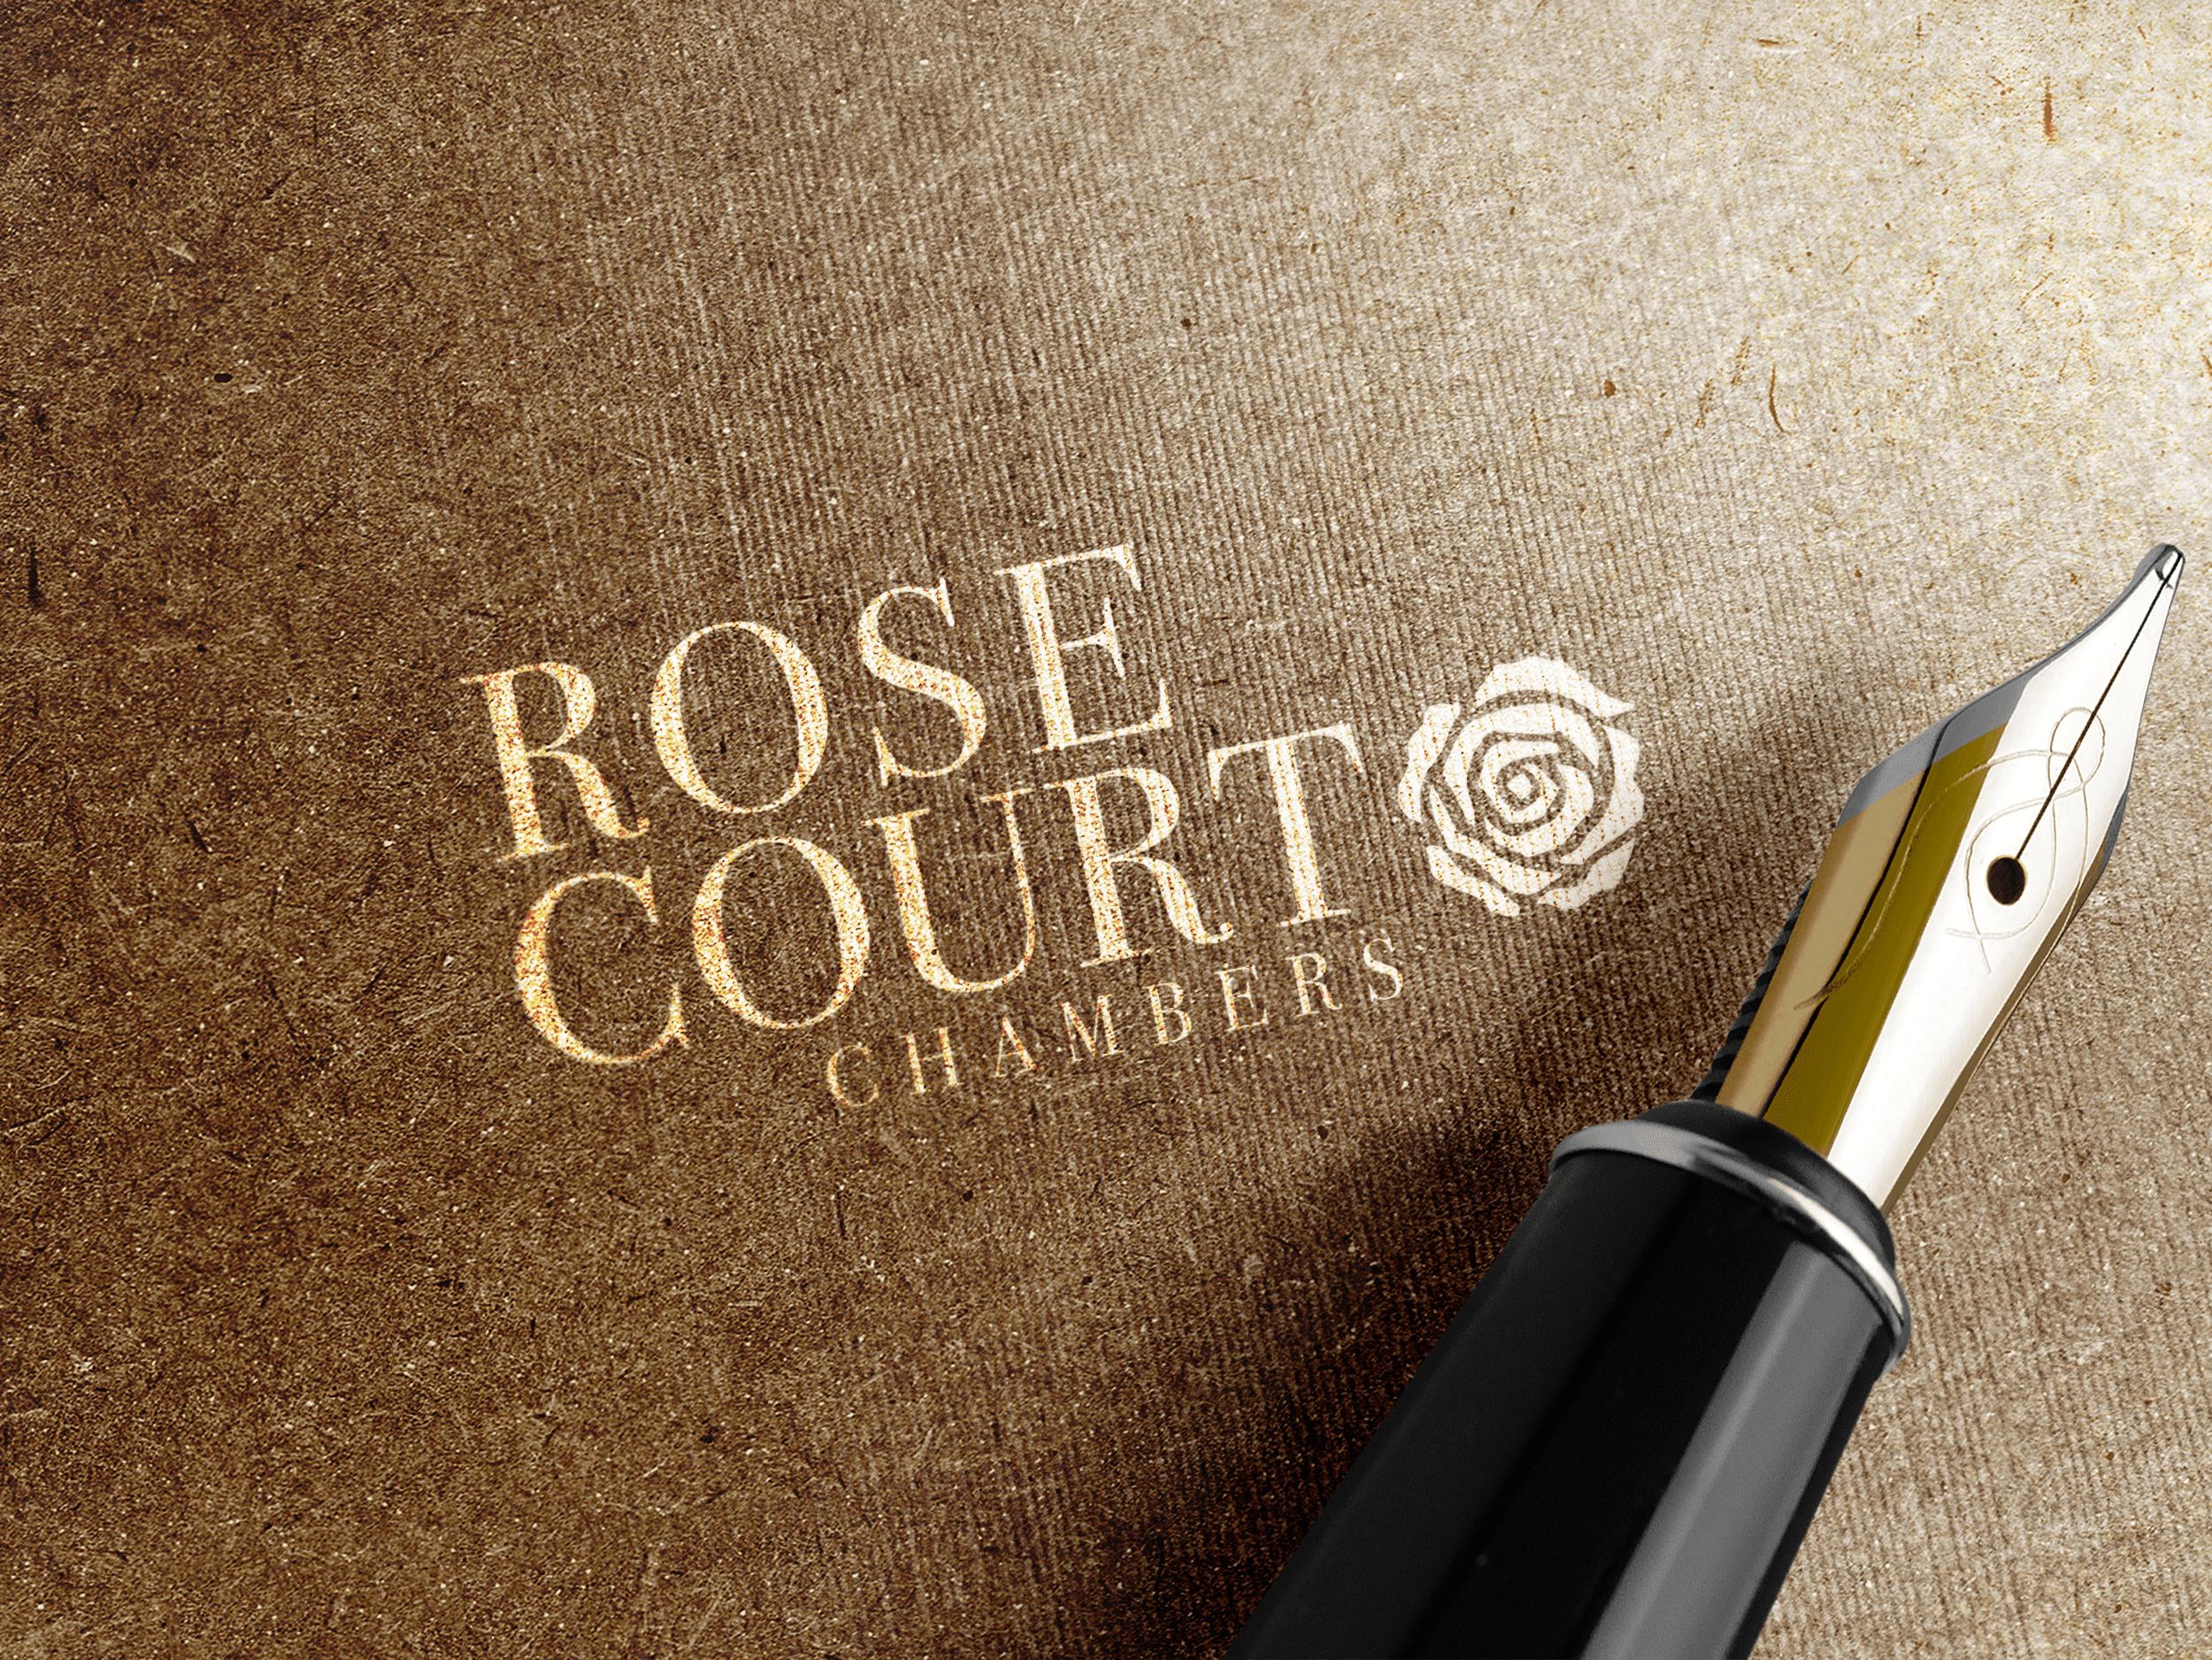 Rose Court Pen